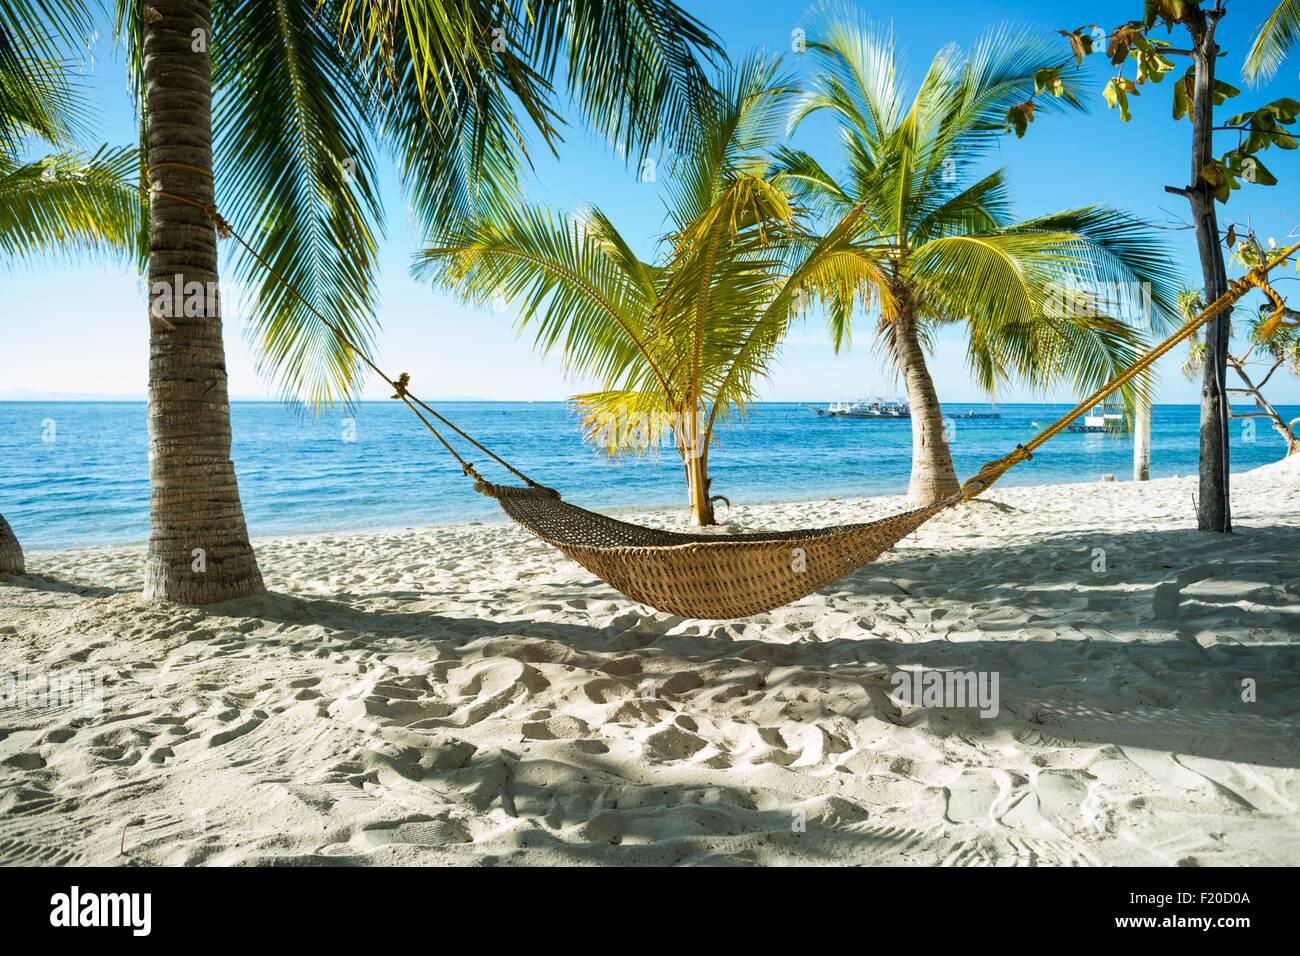 Hammock on tropical beach, Cebu, Philippines Stock Photo ...